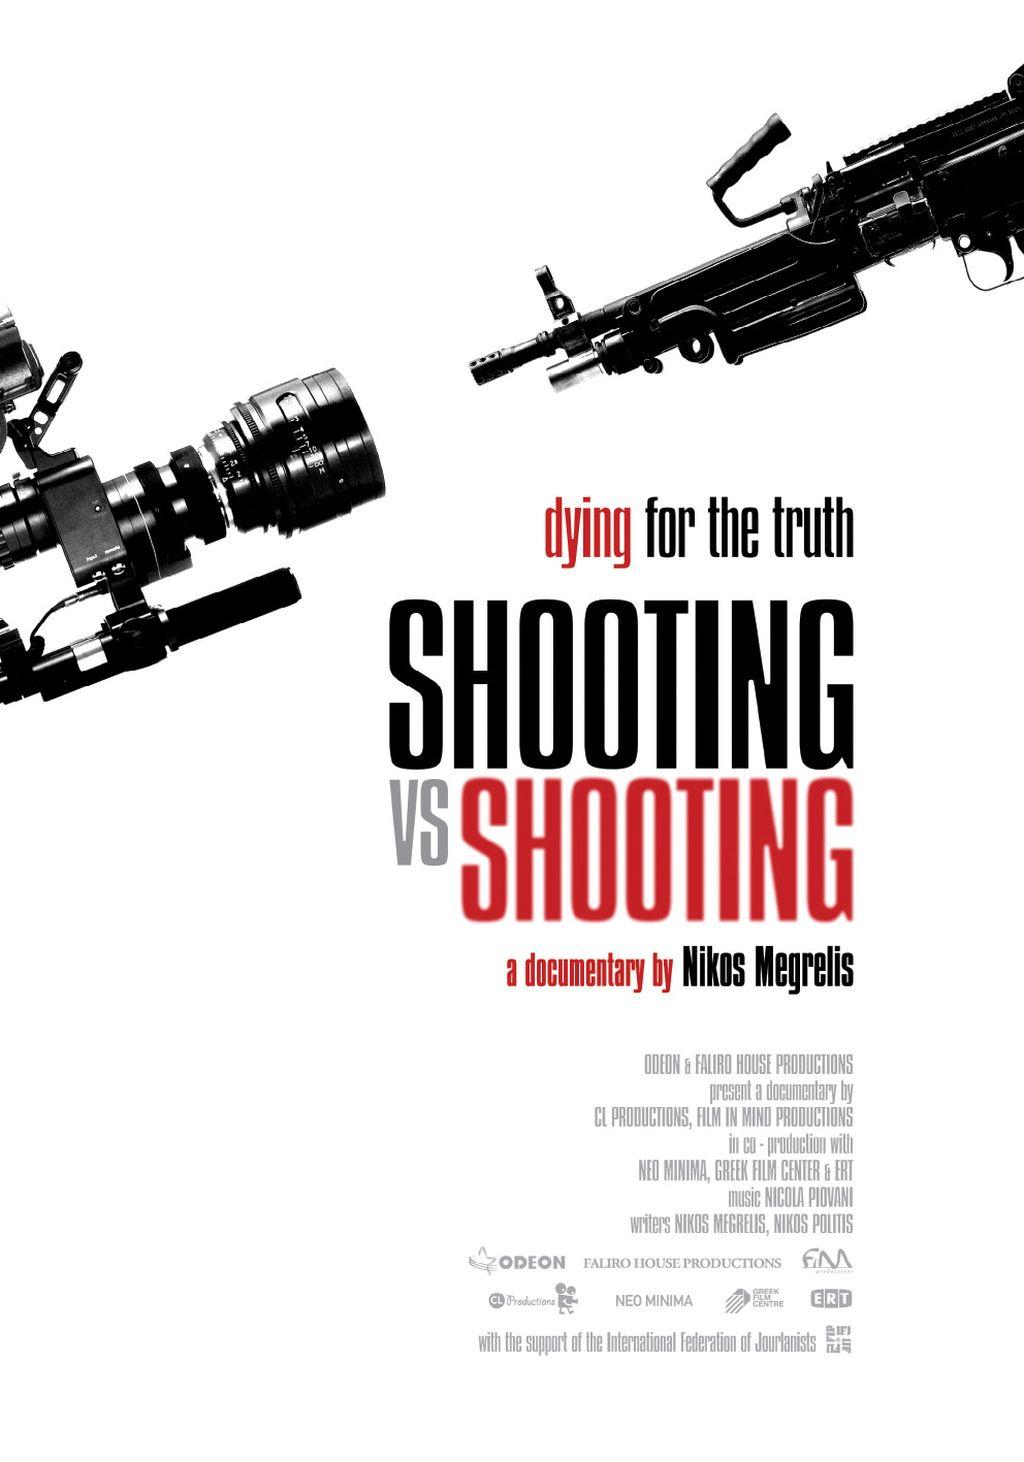 ATEŞE KARŞI ÇEKİM / PETHENONTAS GIA TIN ALITHIA / SHOOTING VS. SHOOTING